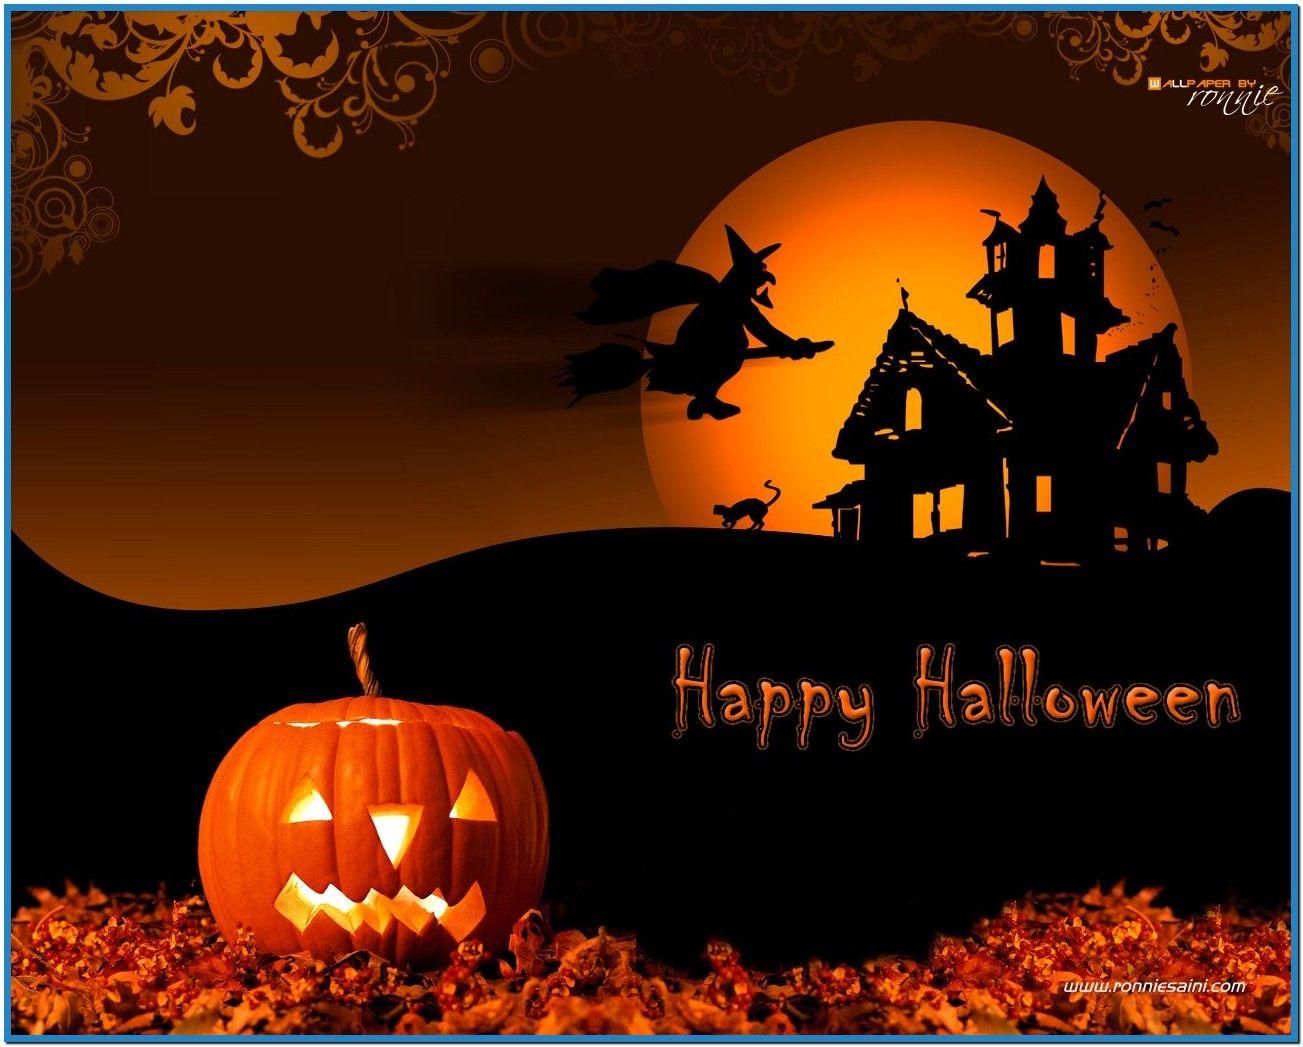 halloween backgrounds and screensavers | Halloween screensavers ...